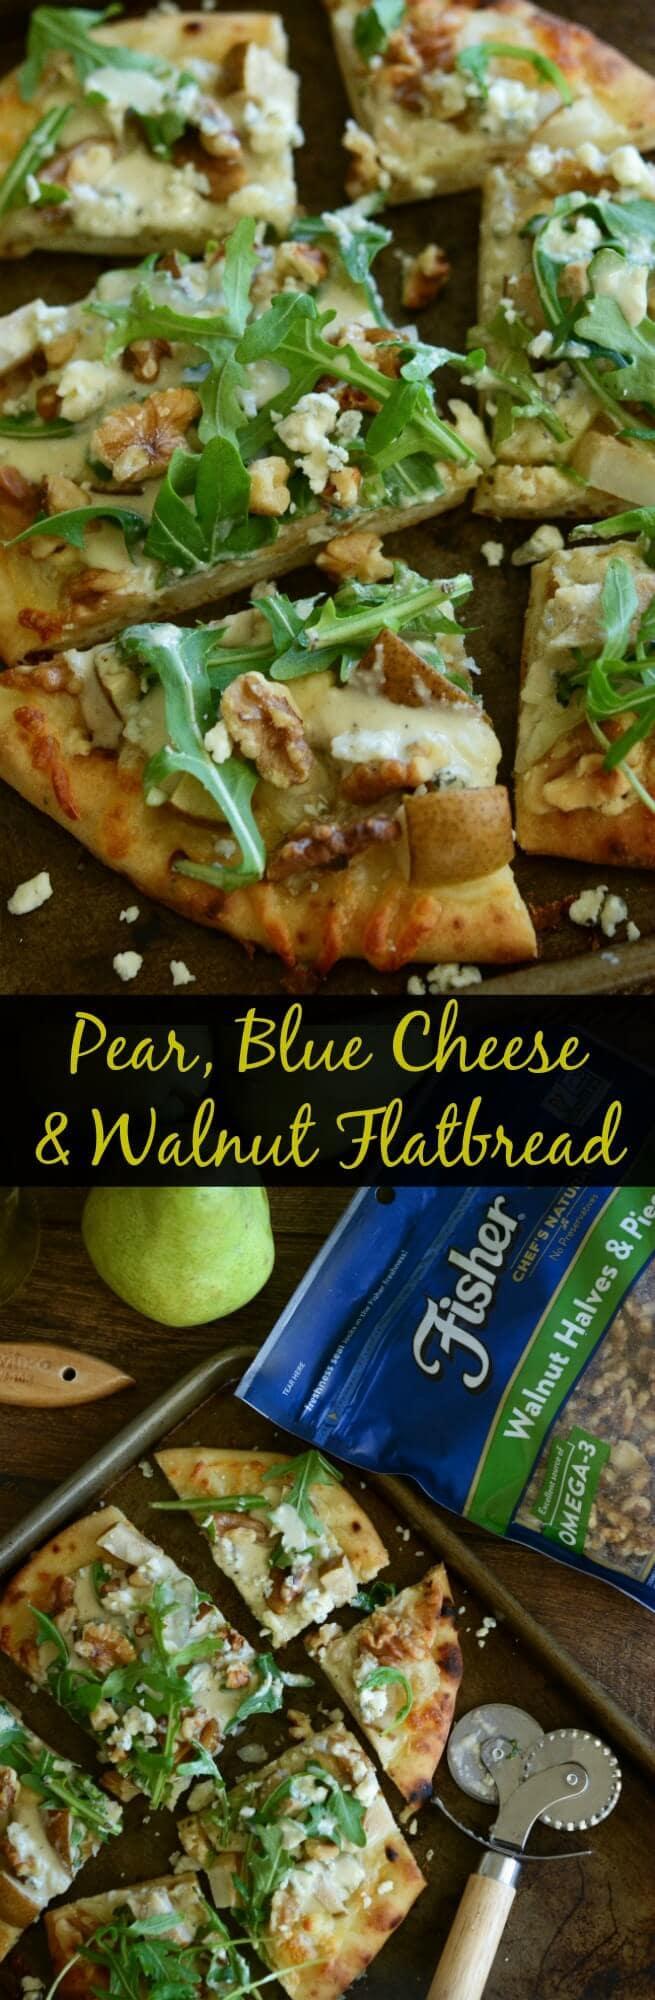 Pear, Blue Cheese & Walnut Flatbread - ready in 20 minutes!